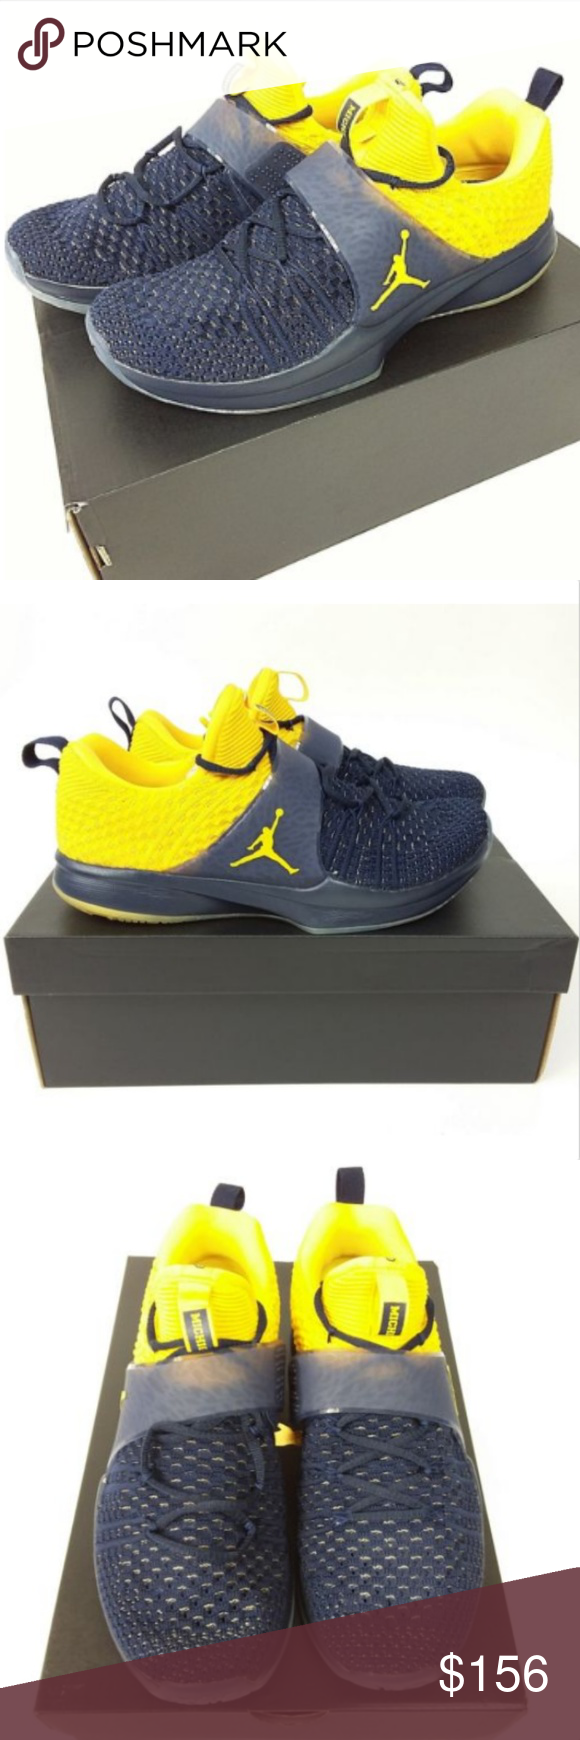 Mens Nike Jordan Trainer 2 Flyknit Shoes Disclosure  All Nike brand items  sold 8f61f55da